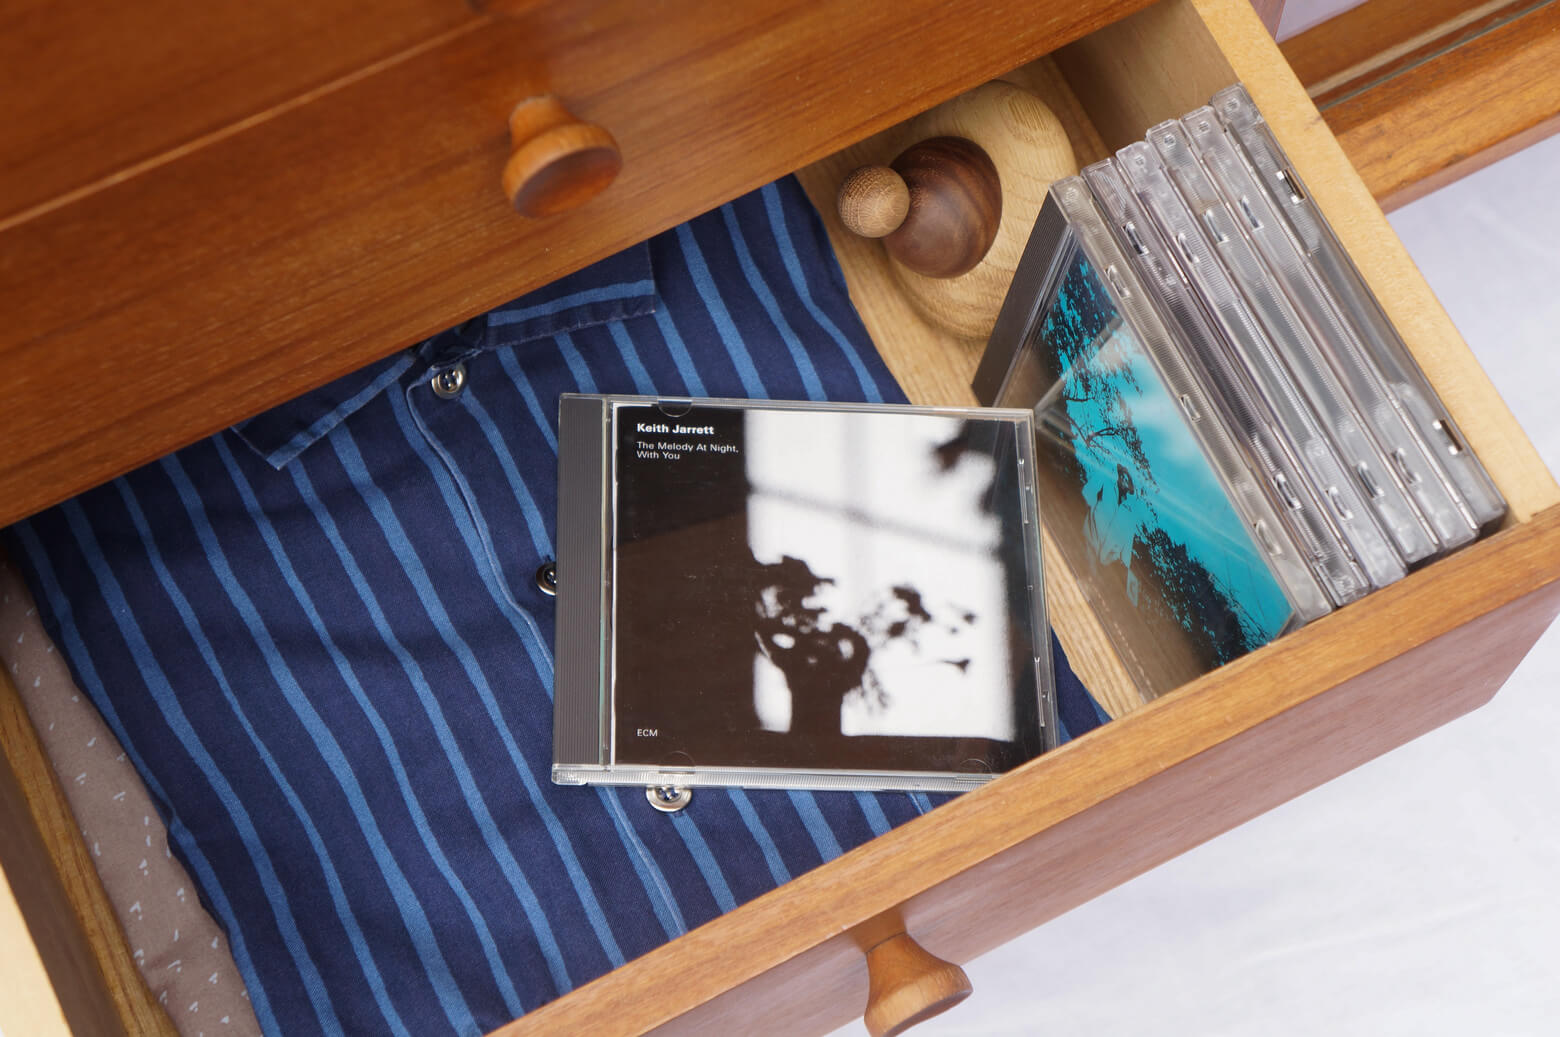 Japan Vintage Teakwood Sideboard Retro/ジャパン ヴィンテージ チーク材 サイドボード ガラス戸 レトロ TV台 飾り棚